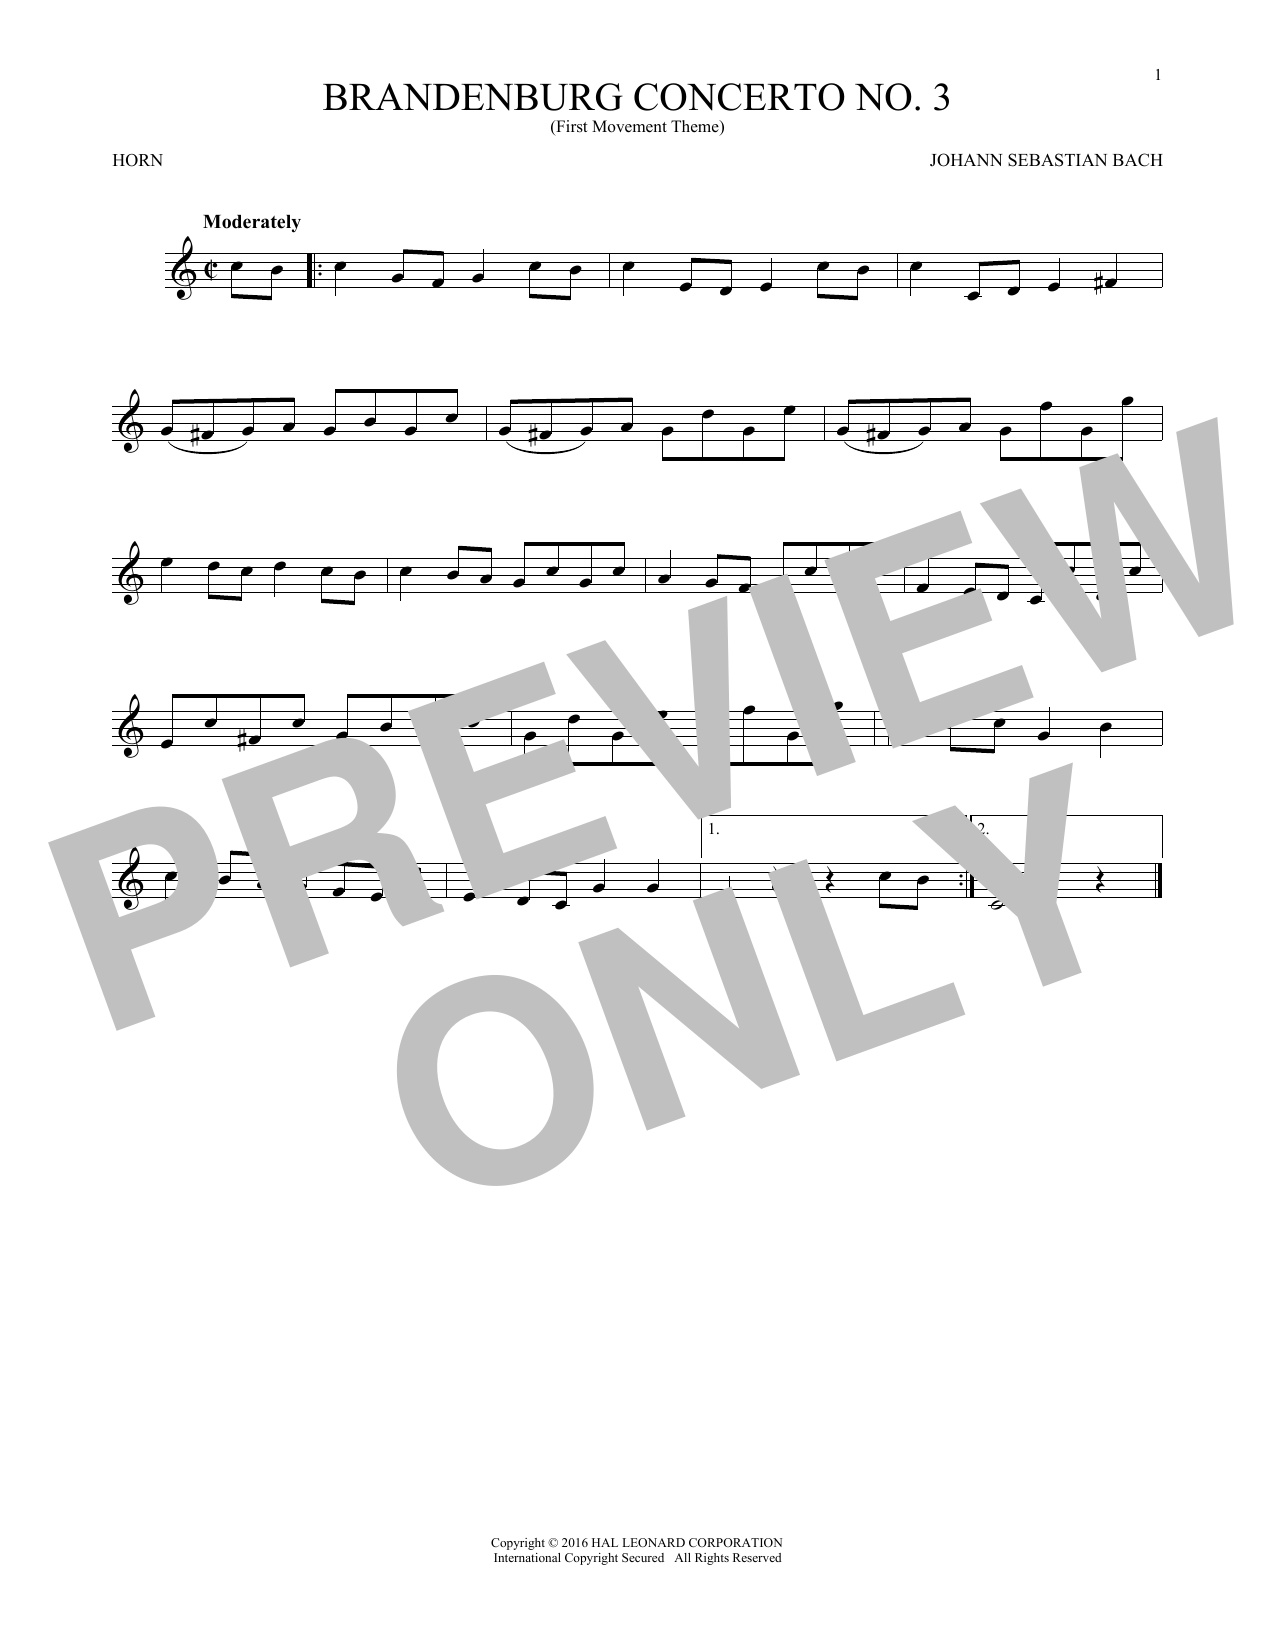 Brandenburg Concerto No. 3 (French Horn Solo)